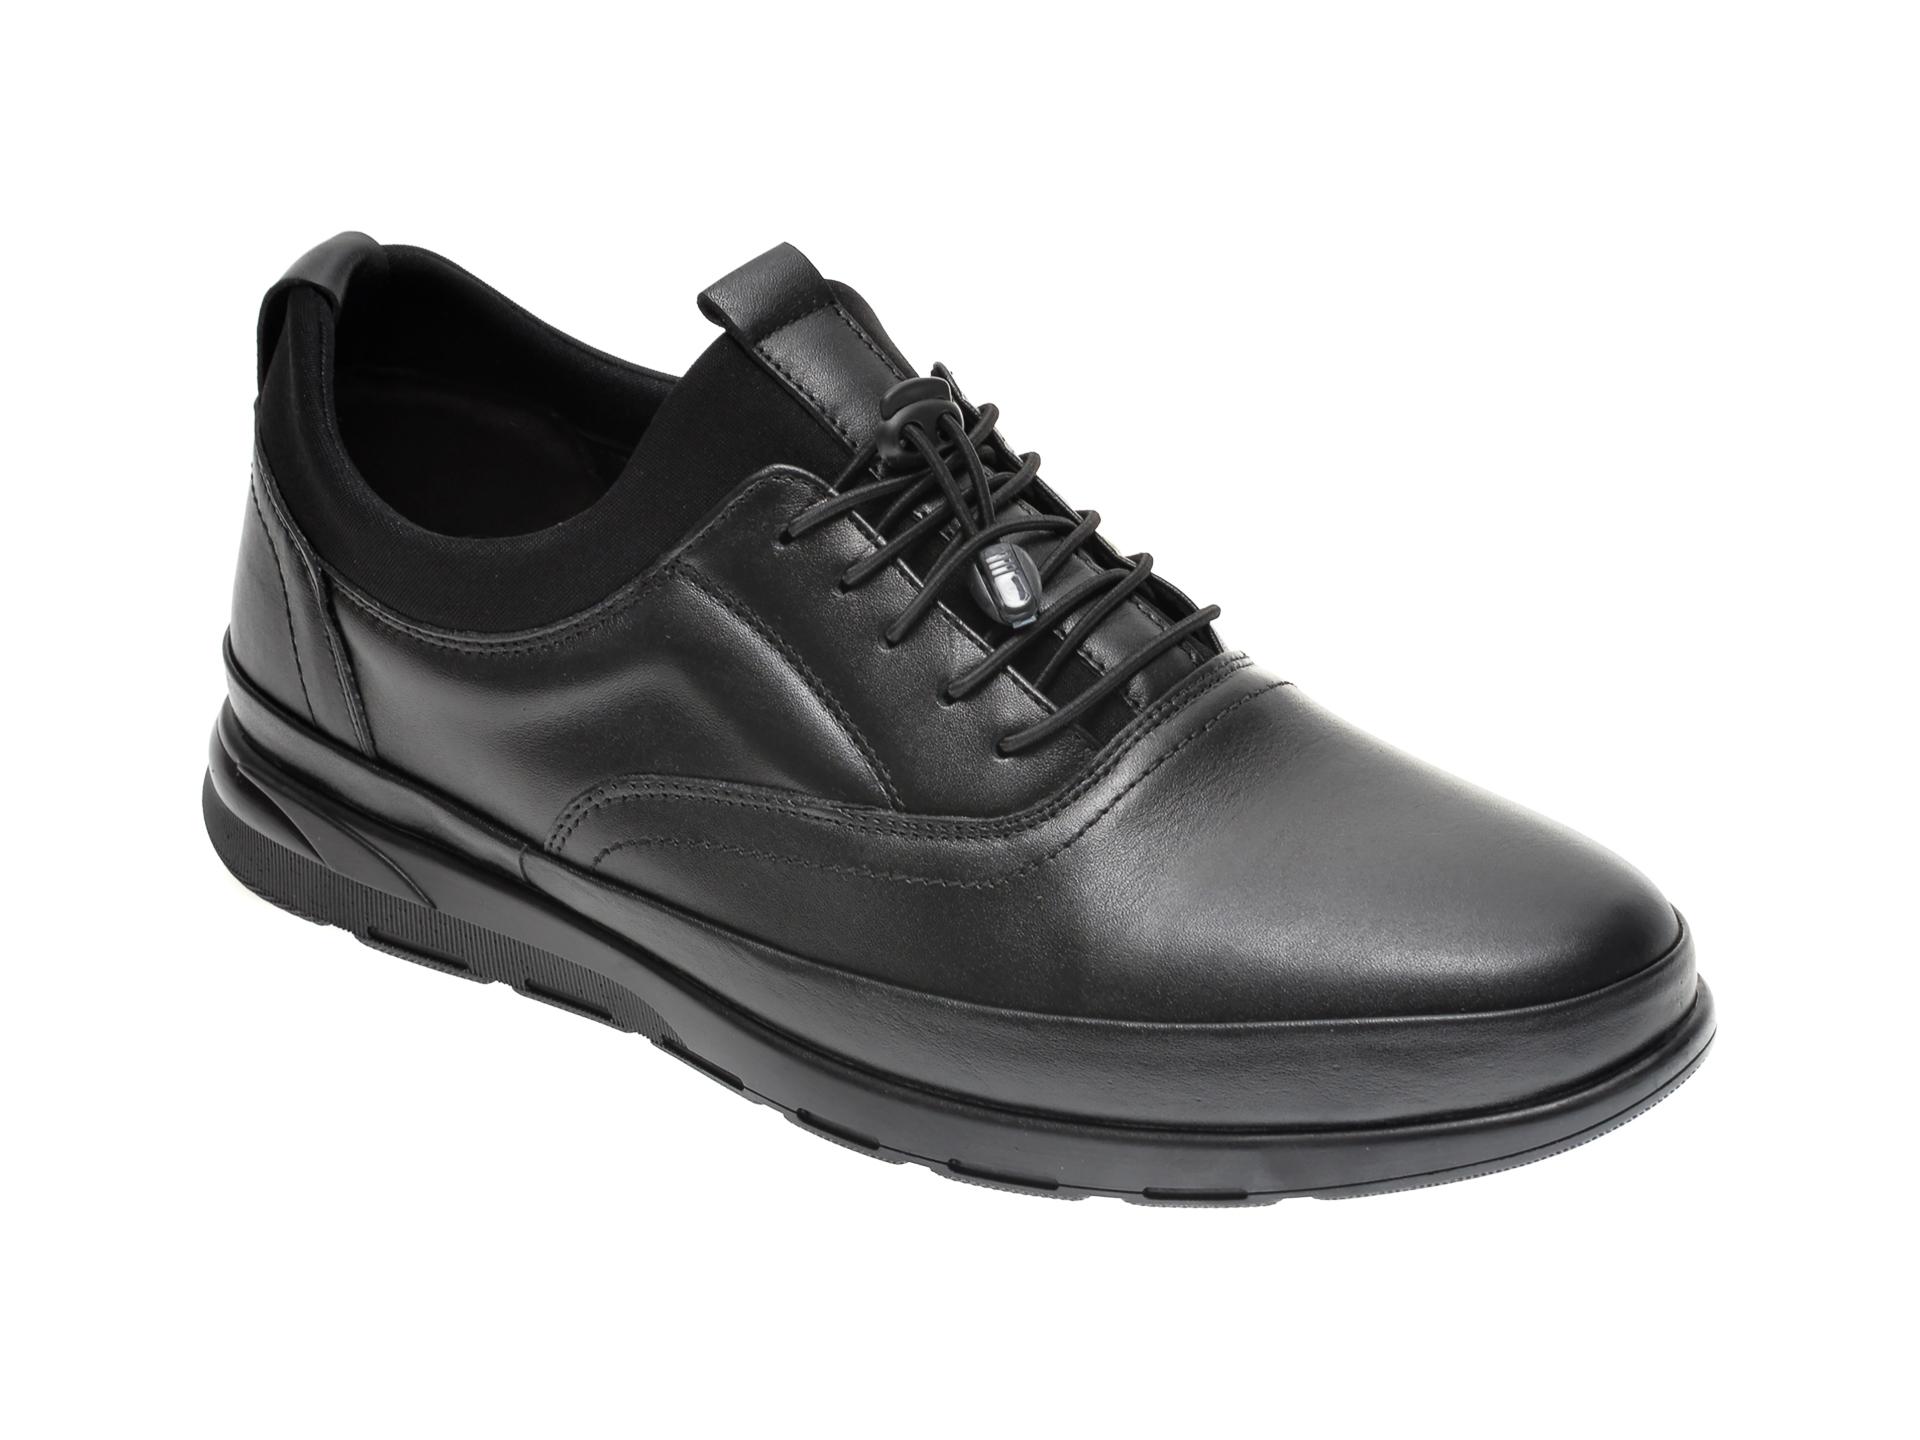 Pantofi OTTER negri, 1437, din piele naturala